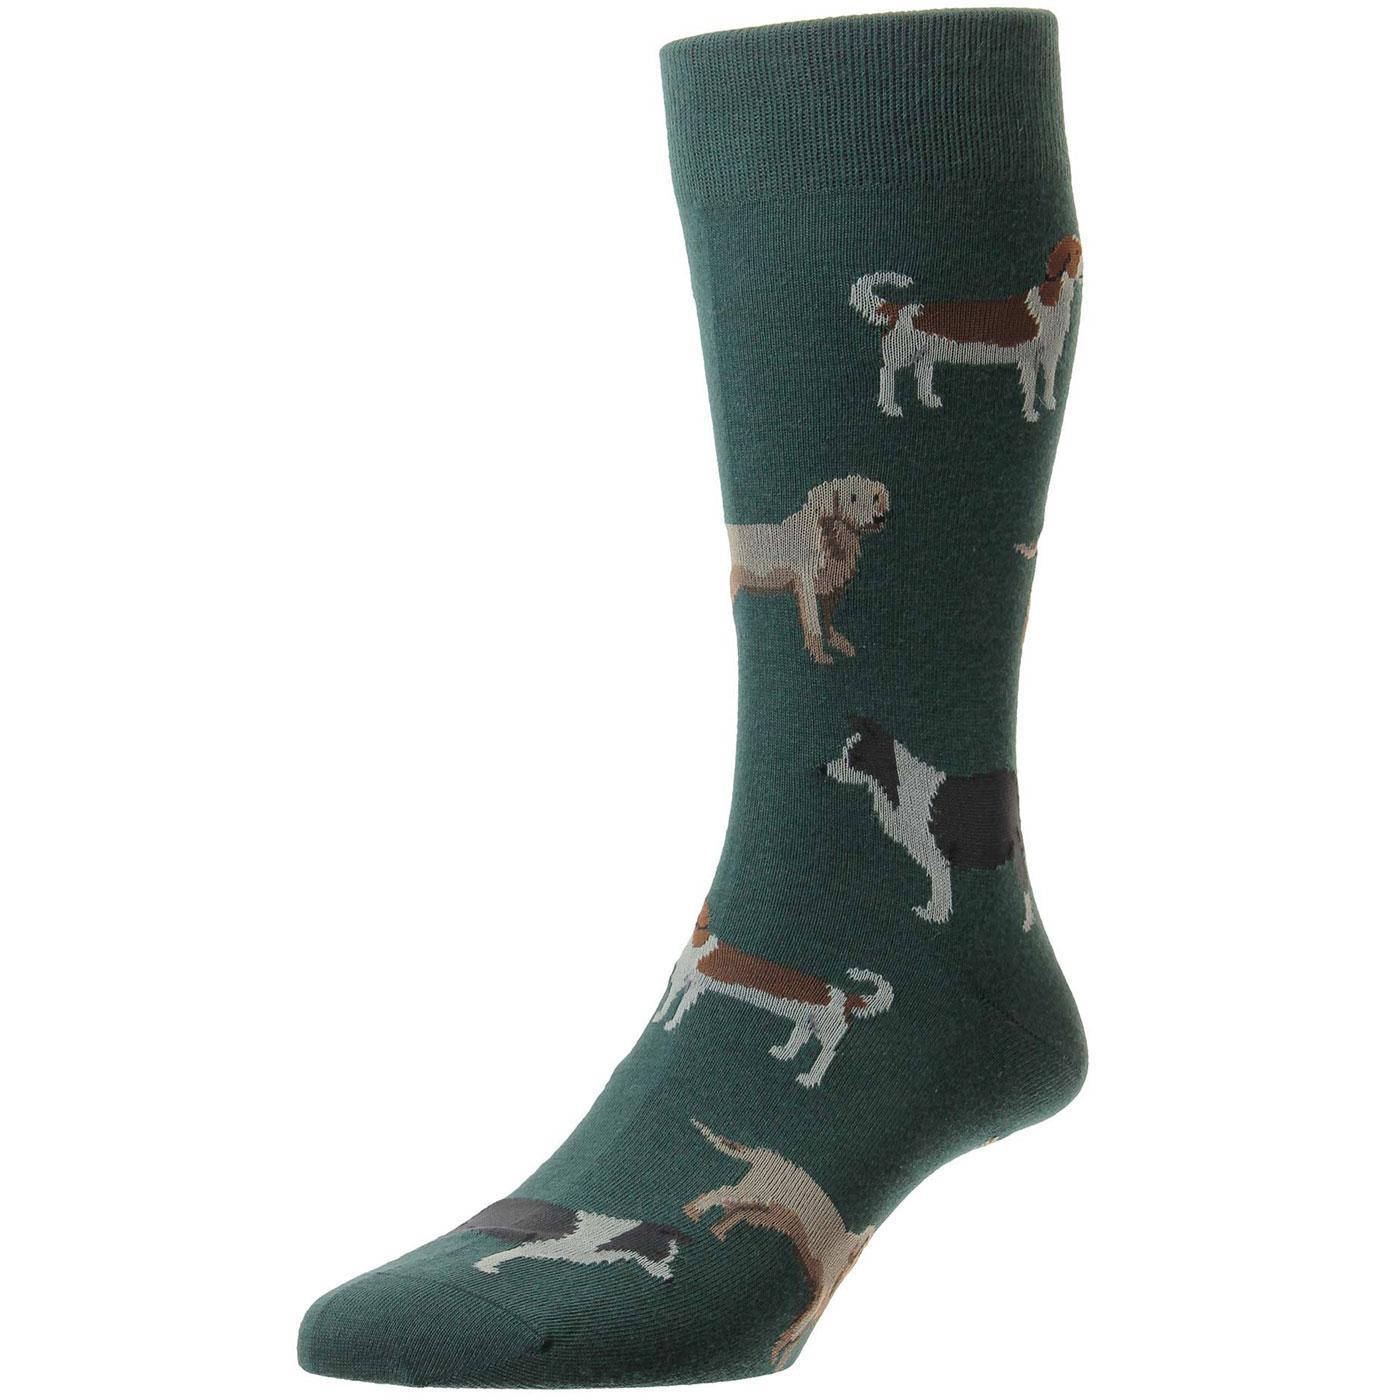 + Peder Dogs SCOTT-NICHOL Mens Dogs Pattern Socks